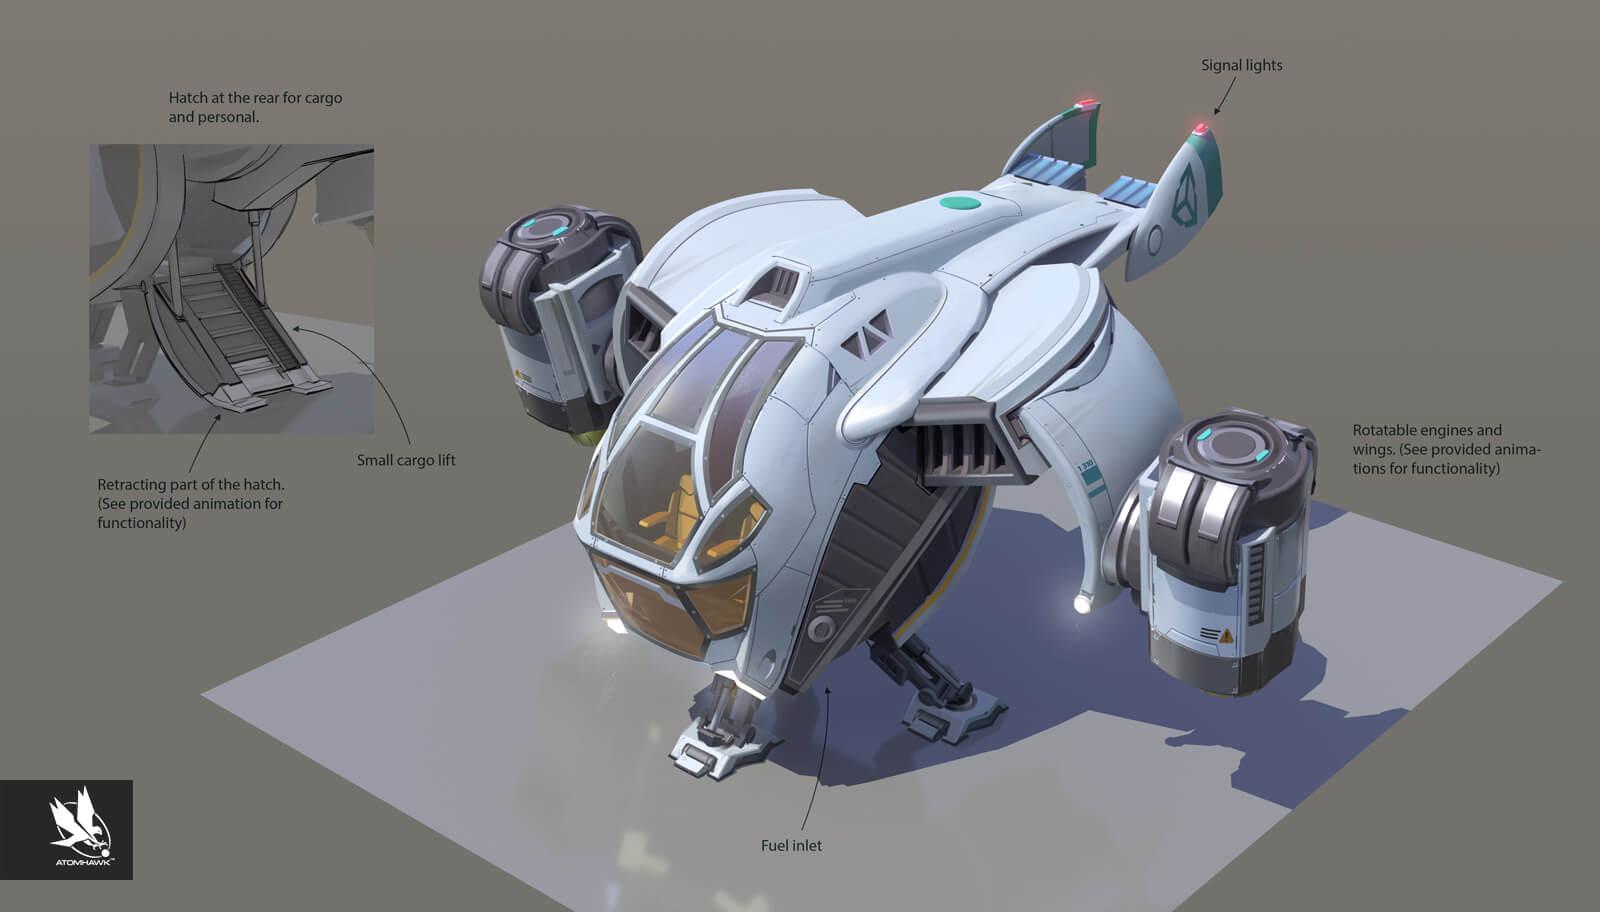 Atomhawk_Unity-3D-Game-Kit-3_Concept-Art_Vehicle-Design_Dropshipketch2.jpg